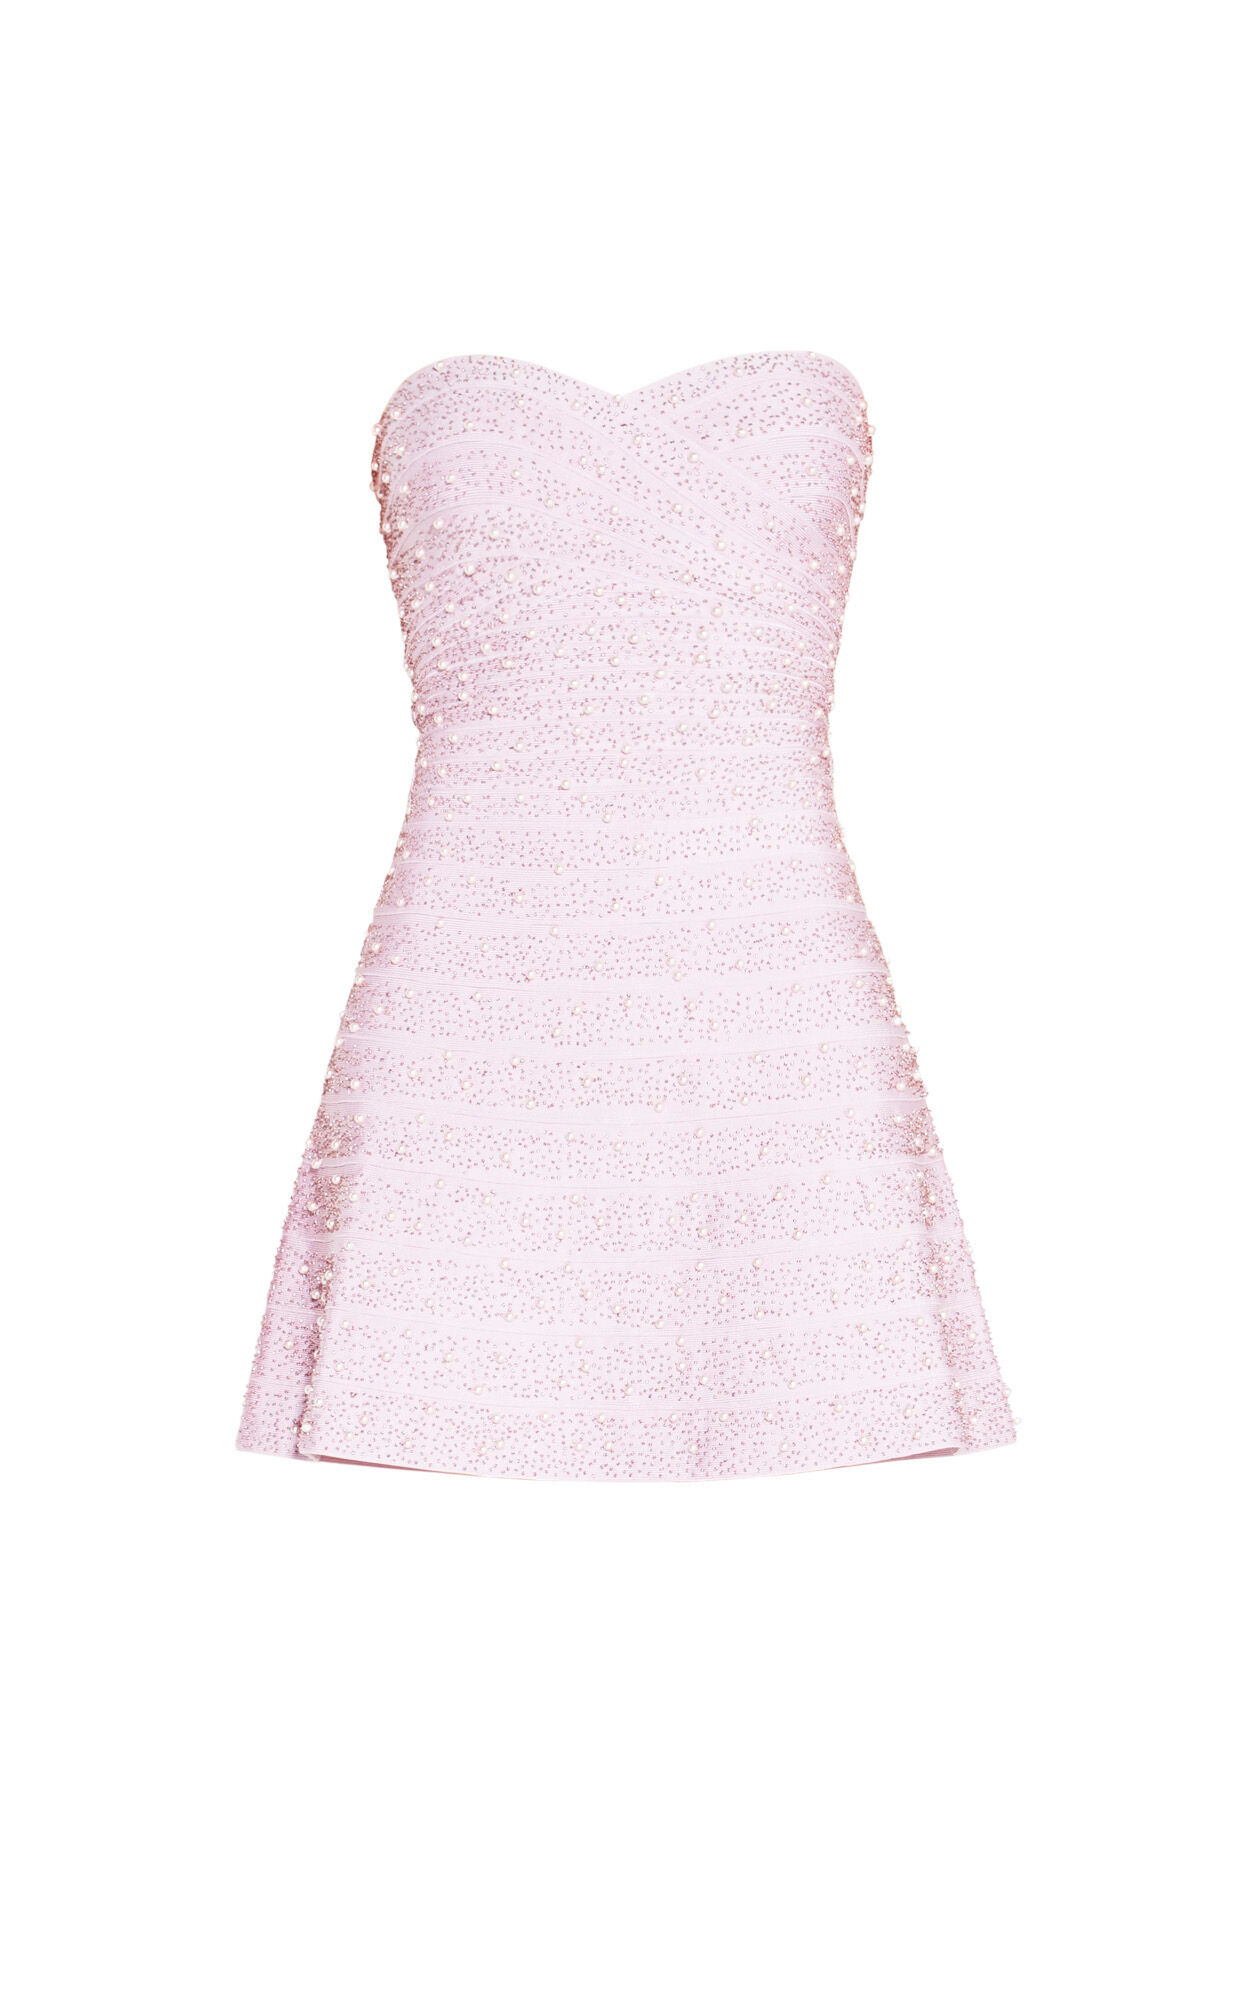 Nova Allover Beading Pearls Dress